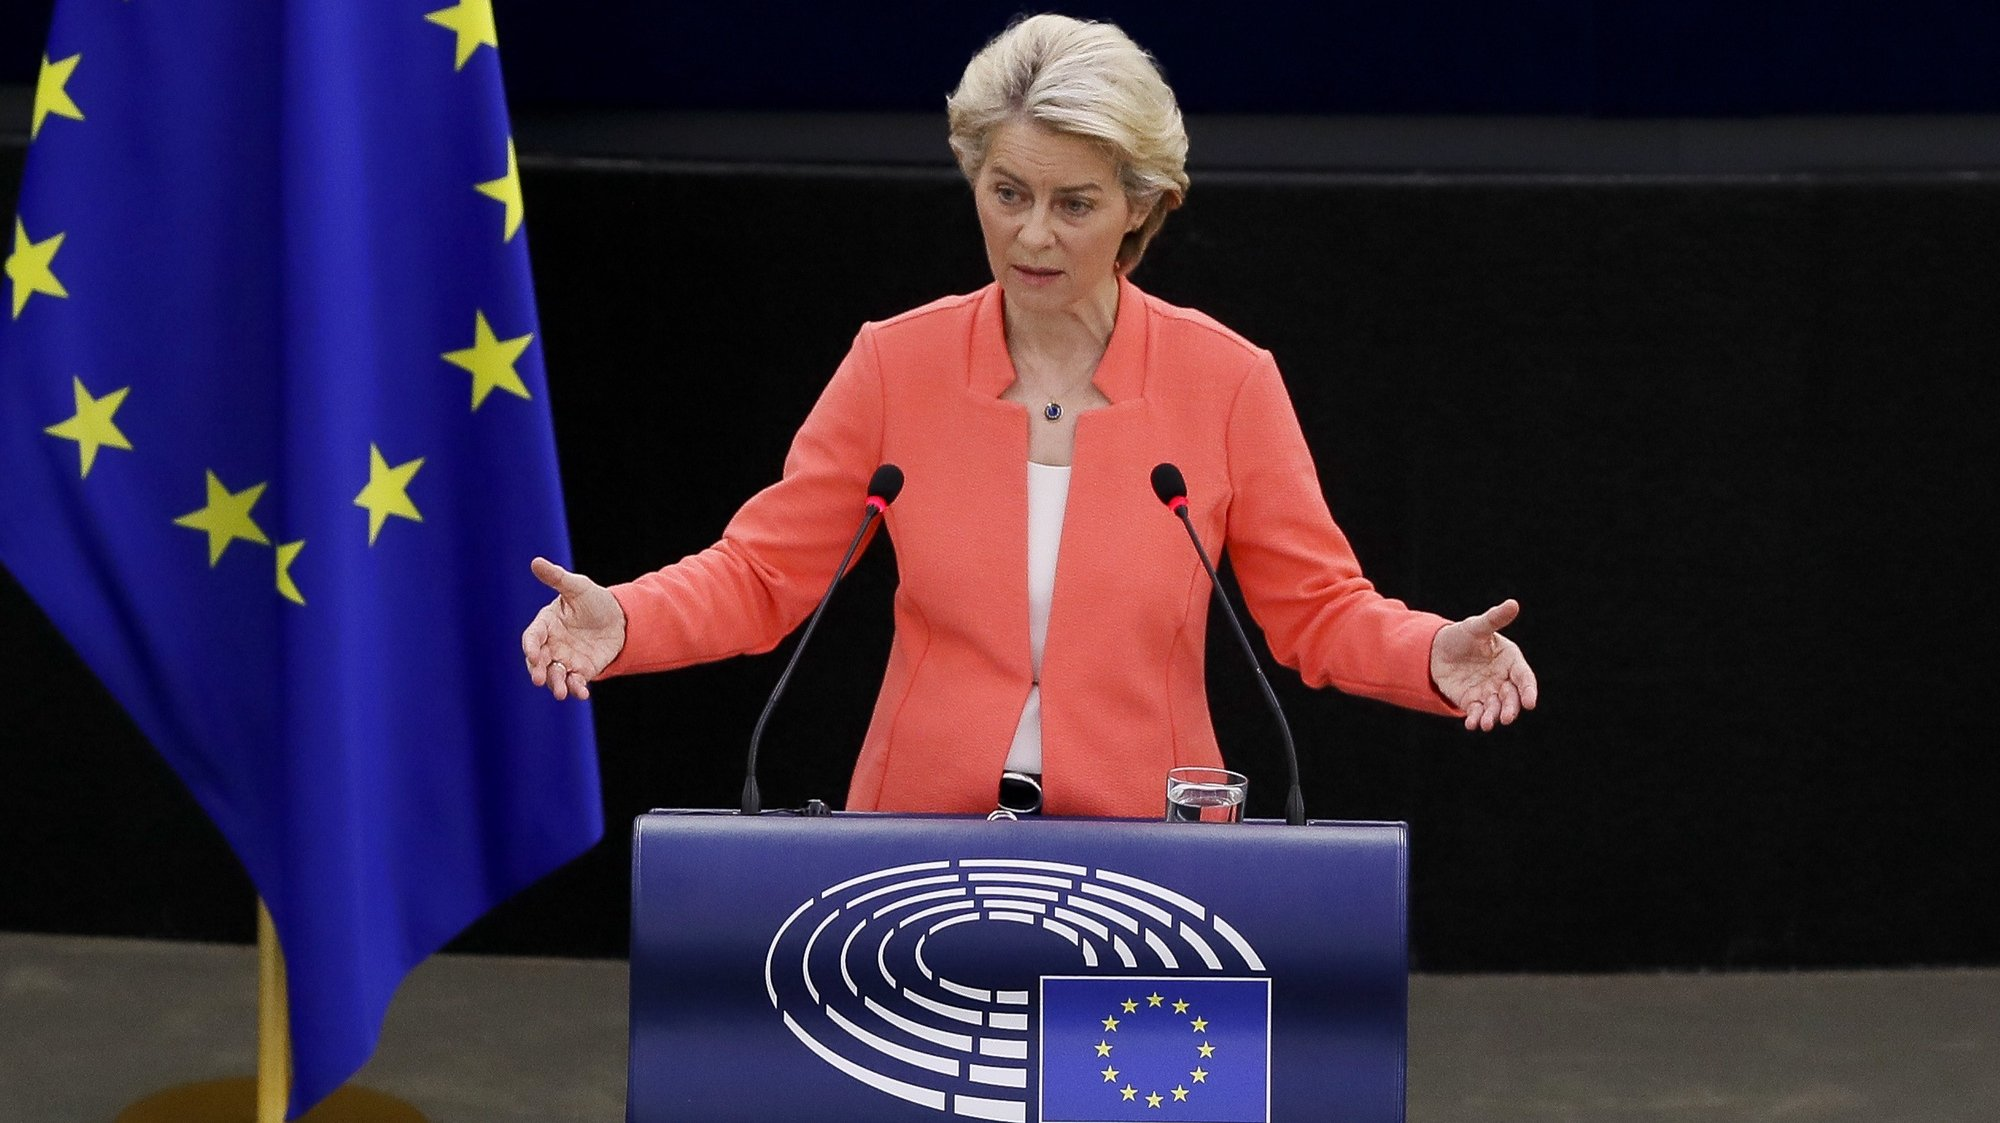 epa09469140 European Commission President Ursula von der Leyen delivers a speech during a debate on 'The State of the European Union' at the European Parliament in Strasbourg, France, 15 September 2021.  EPA/JULIEN WARNAND